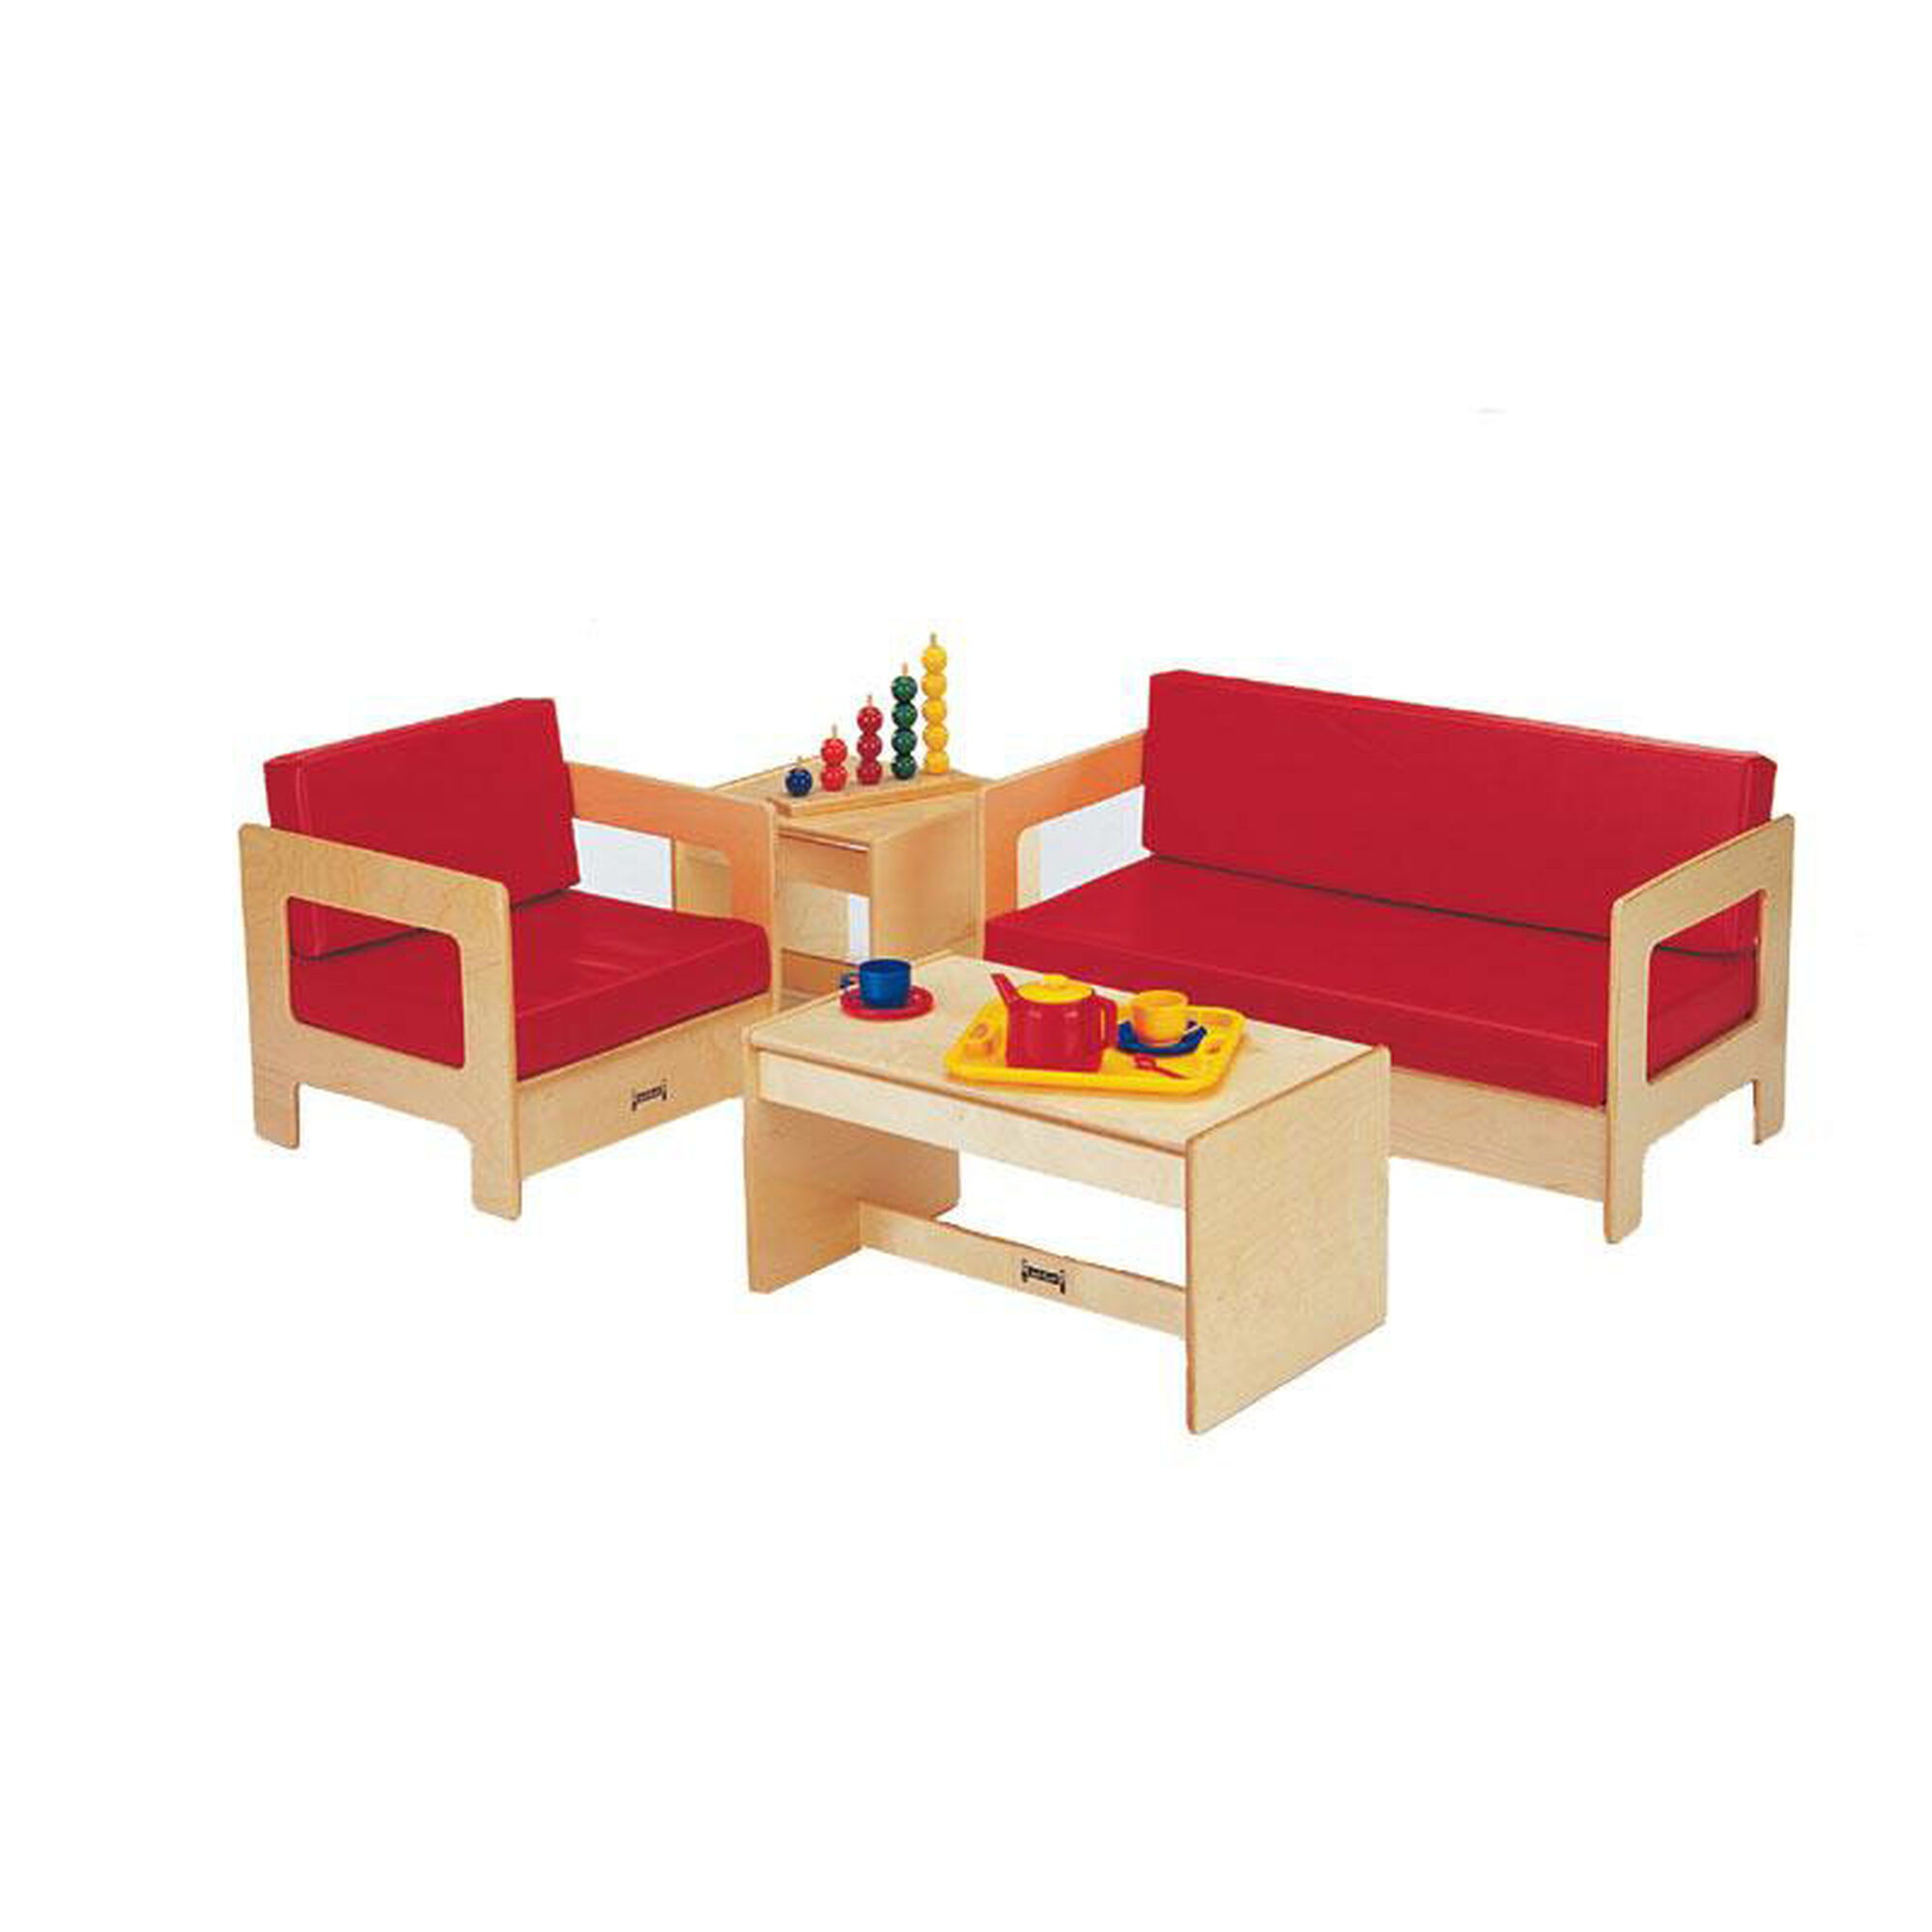 Jonti craft 4 piece living room set 0380jc for 4 piece living room set